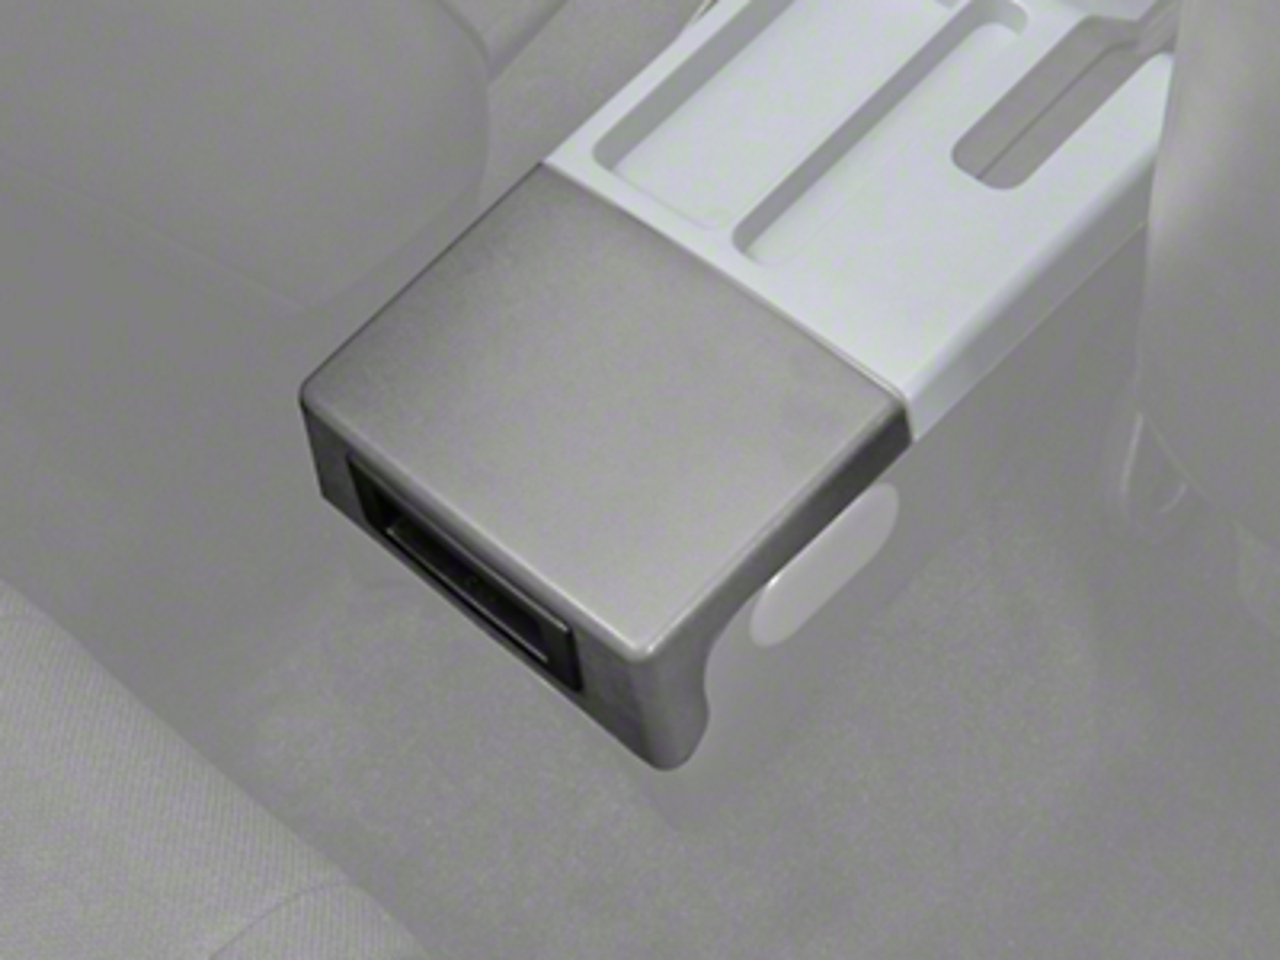 Center Console Arm Rest Delete Plate - Gray (87-93 All)